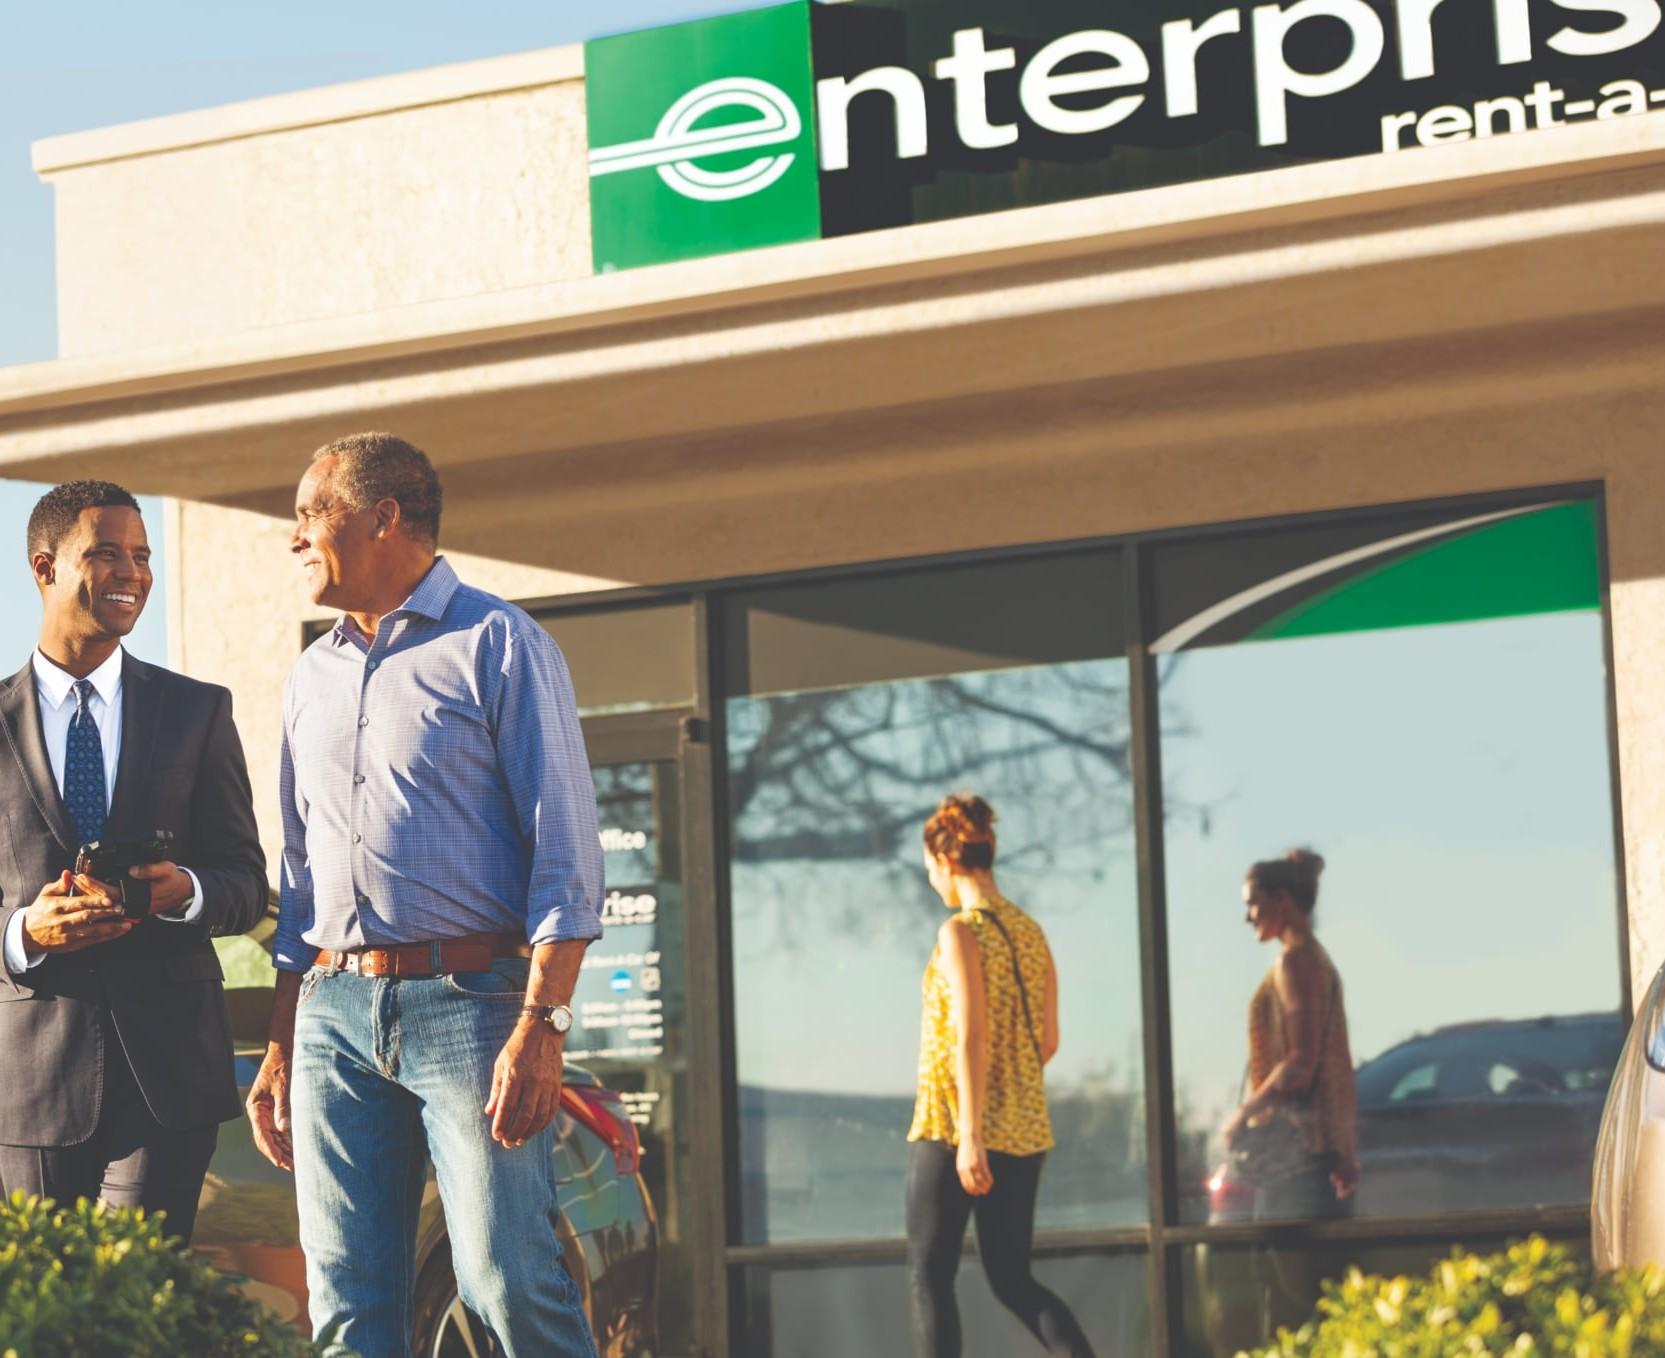 enterprise suv coupon